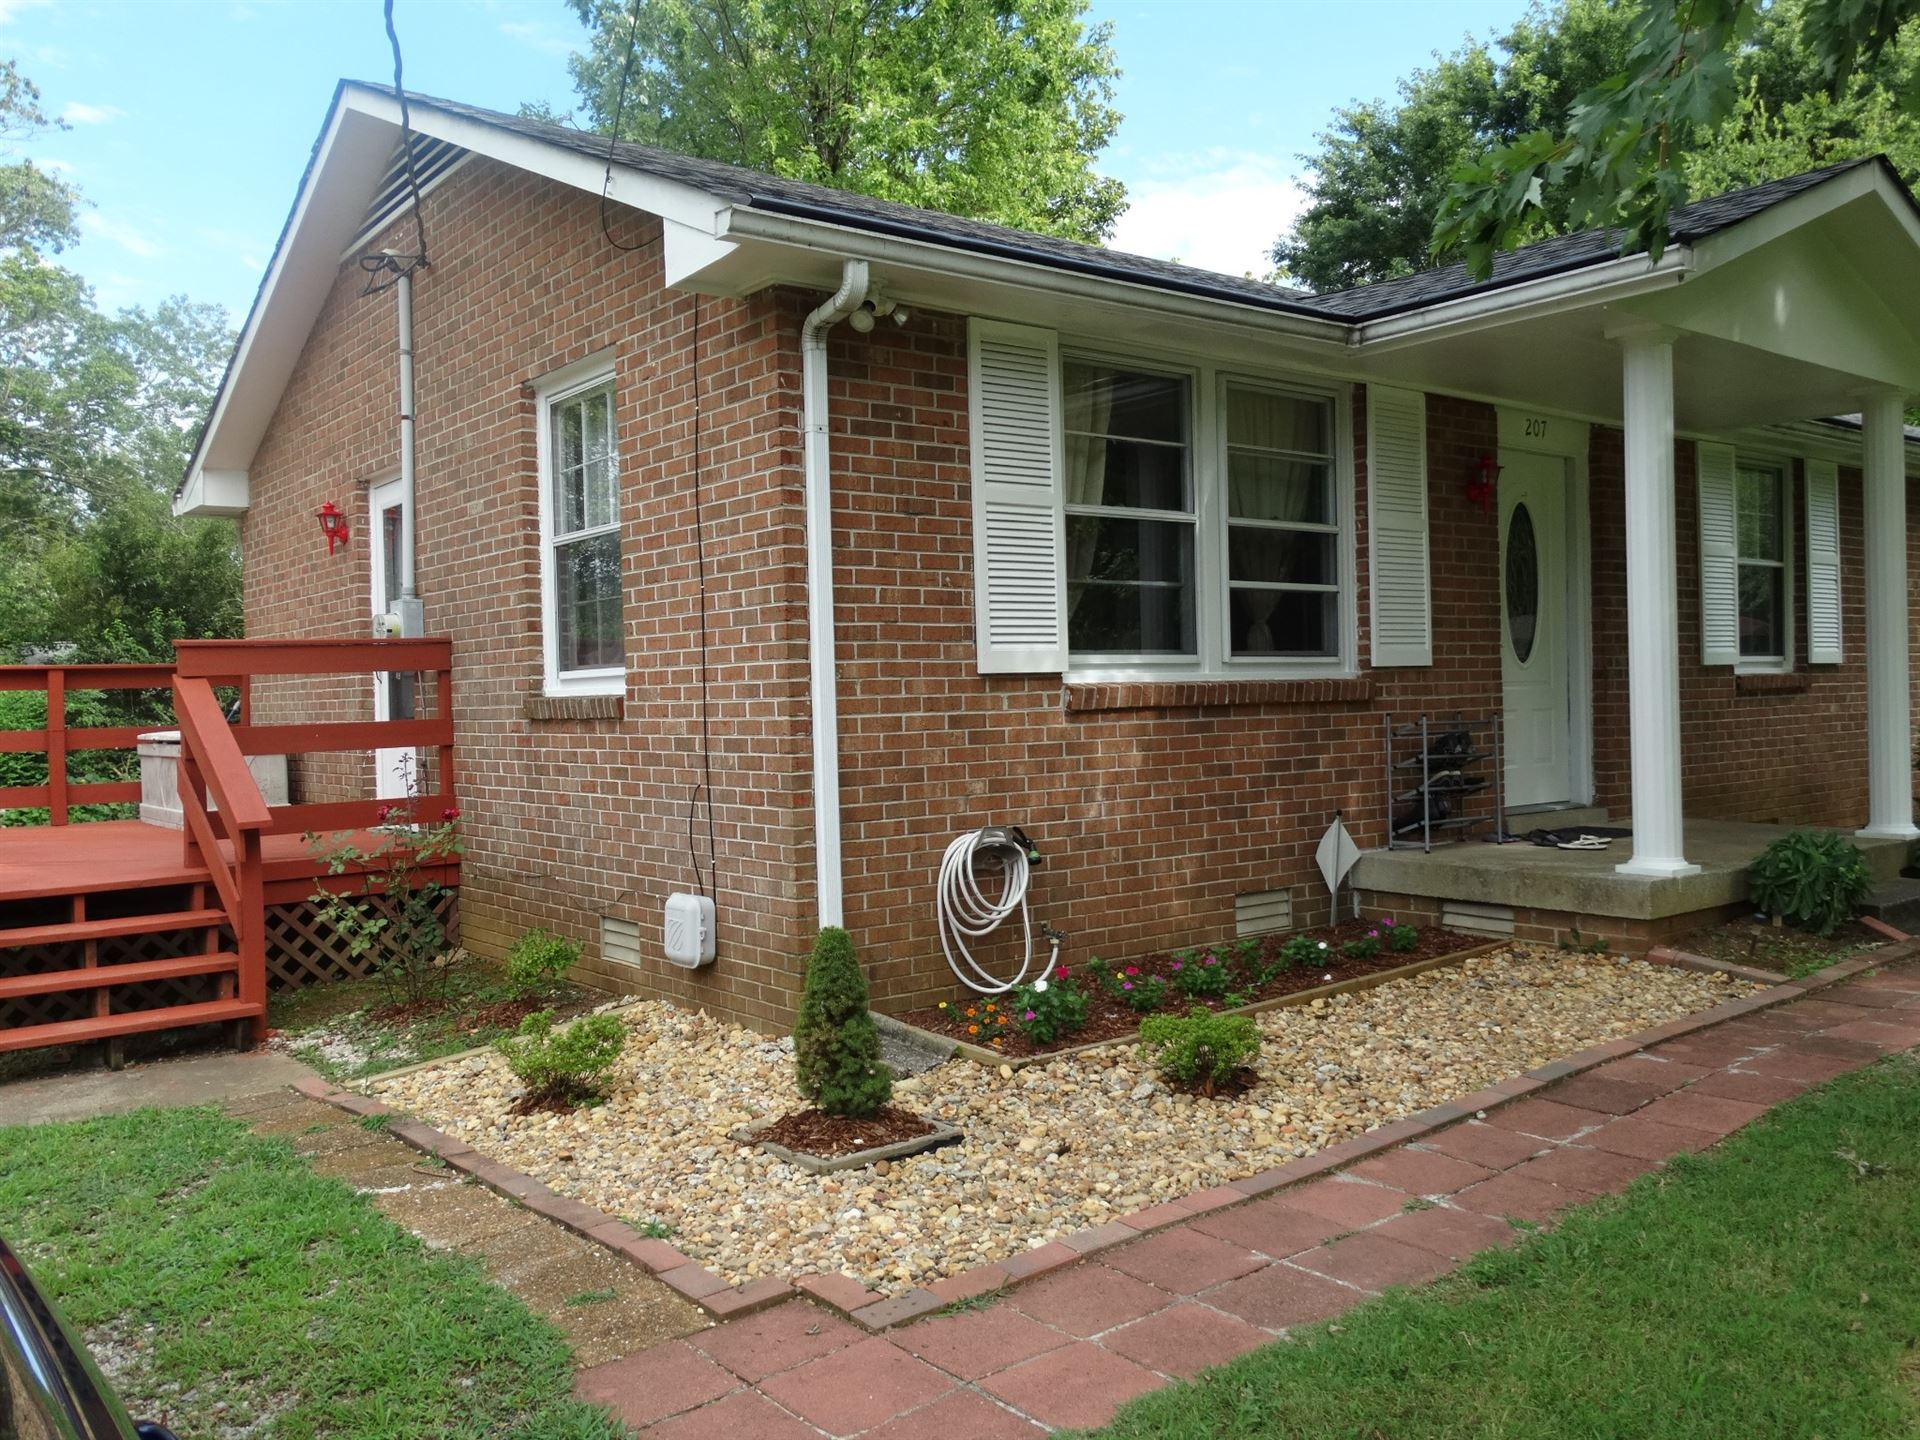 207 Branch Trl, Smyrna, TN 37167 - MLS#: 2184039